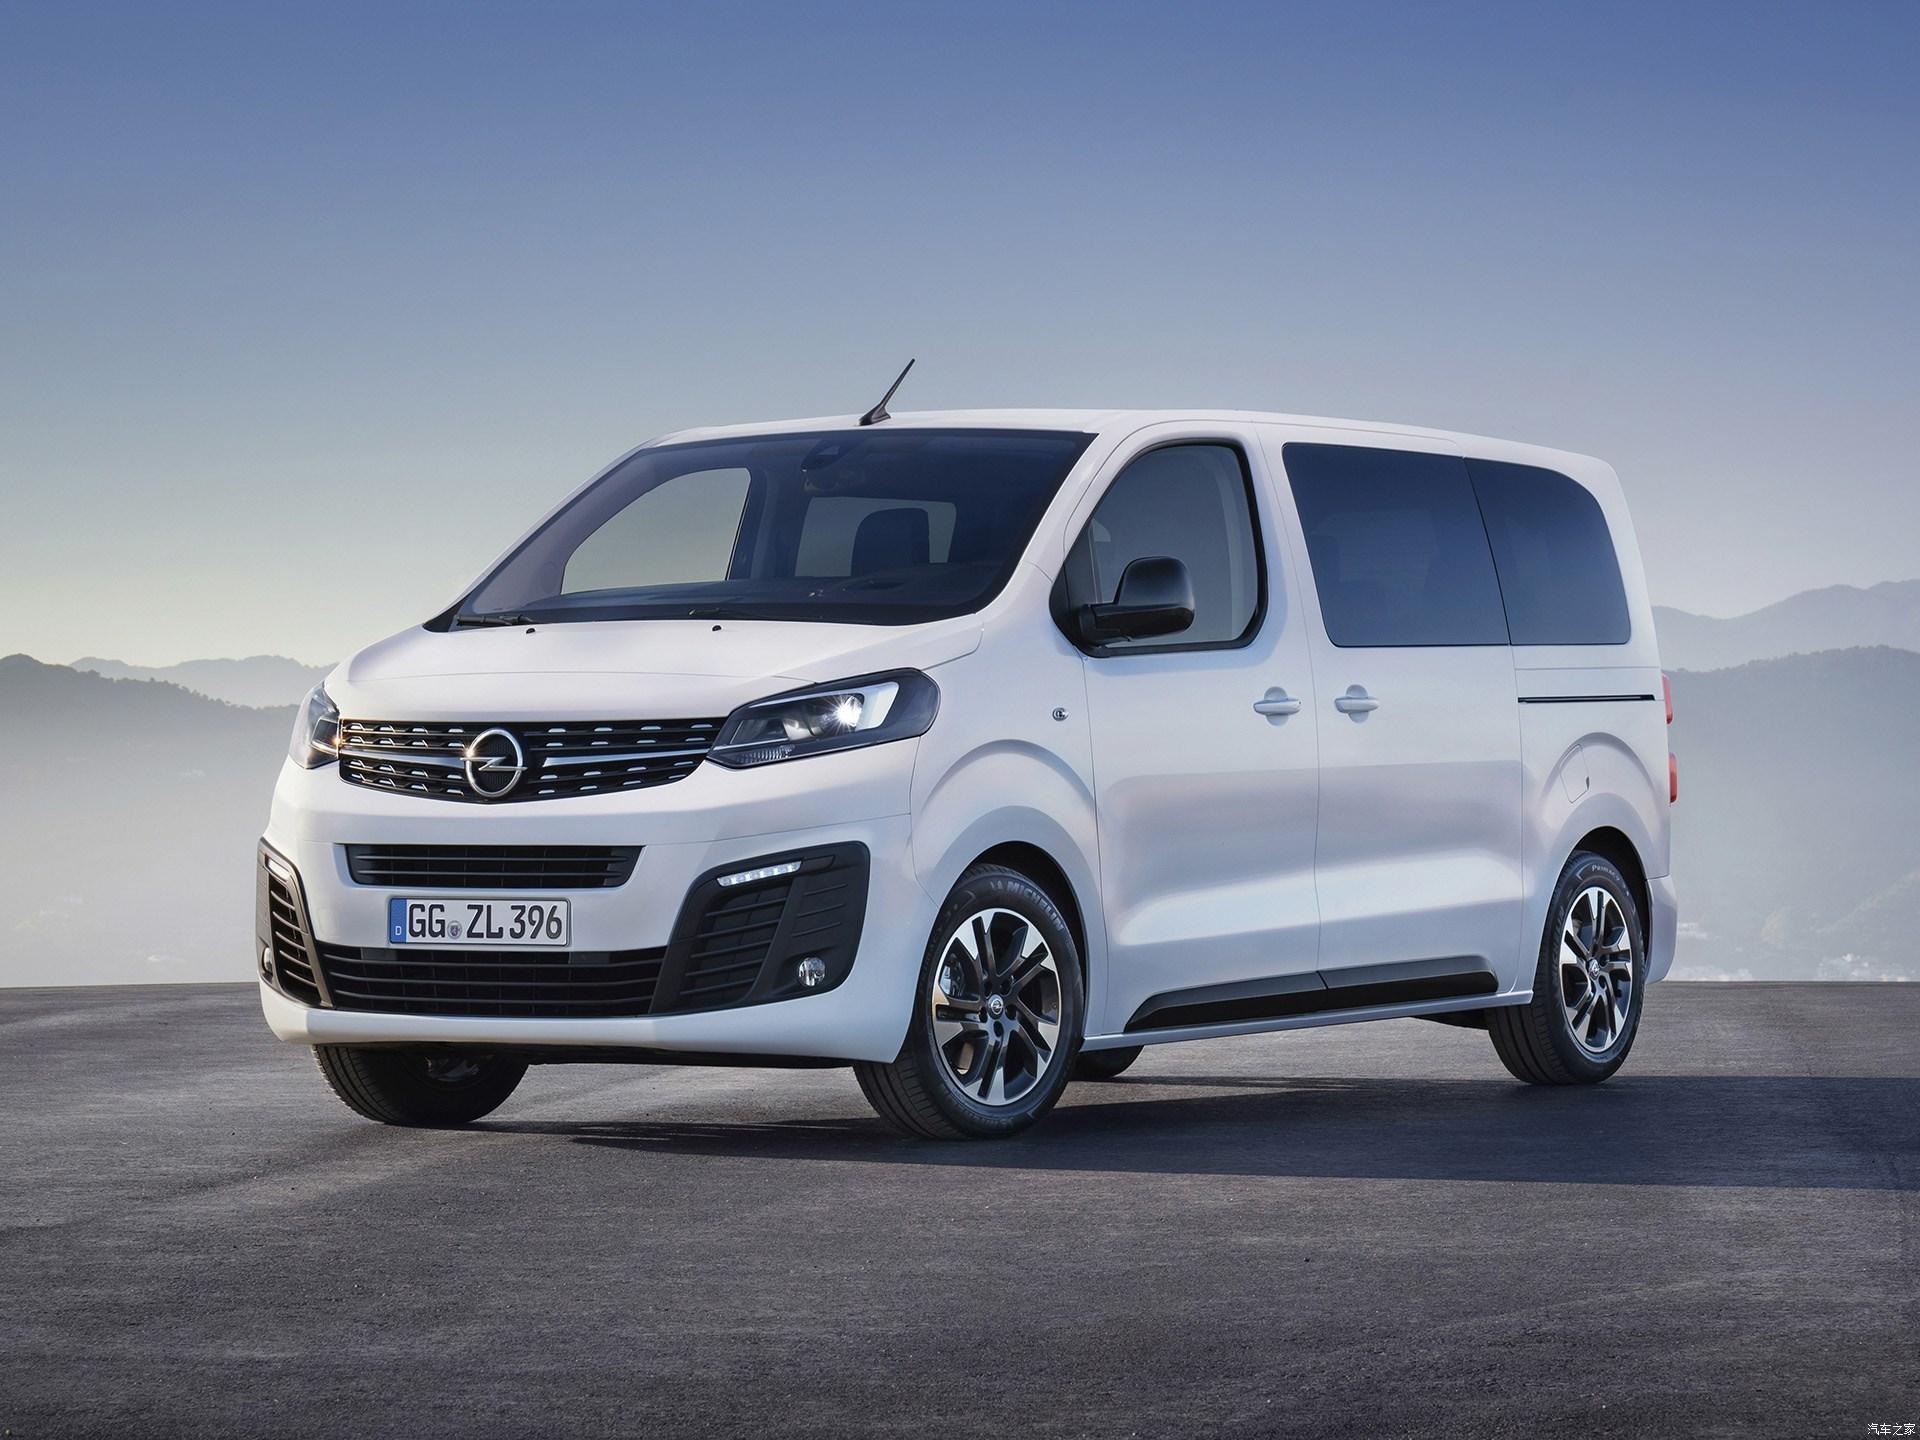 фото Opel Zafira Life 2019 года